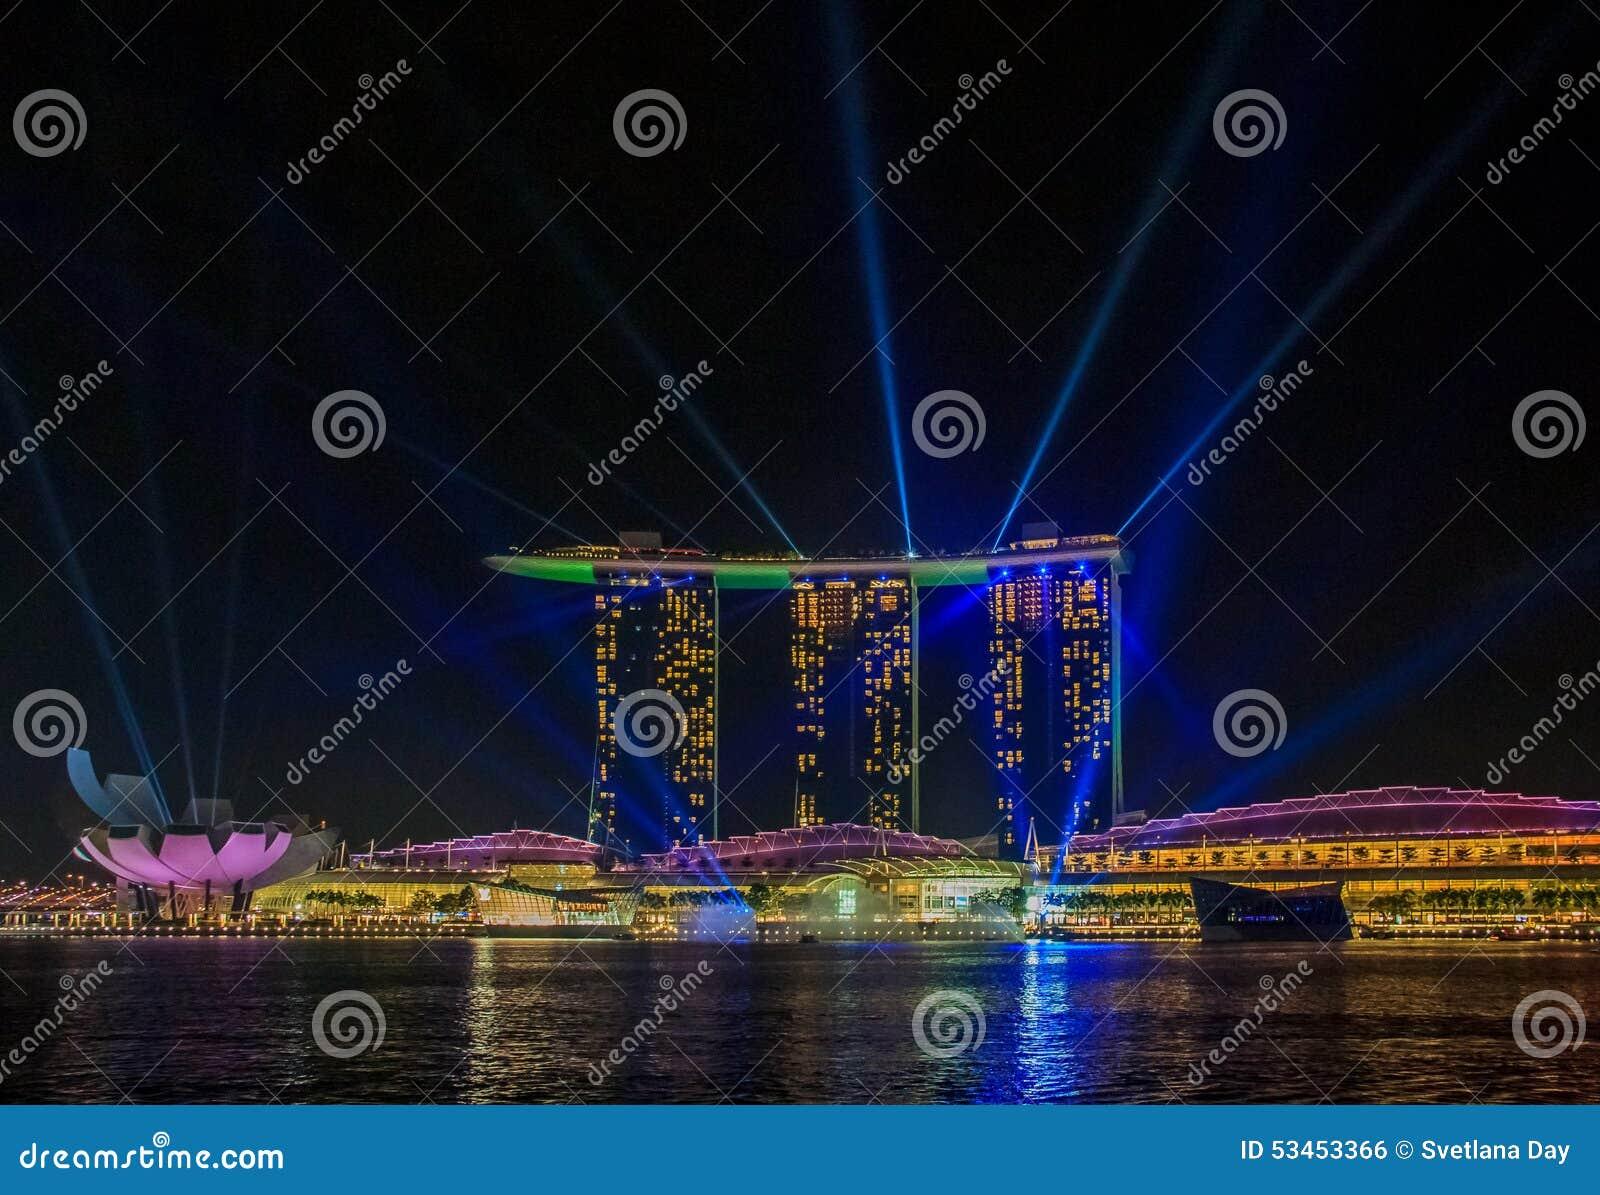 light show at singapore marina bay sands editorial photo image of